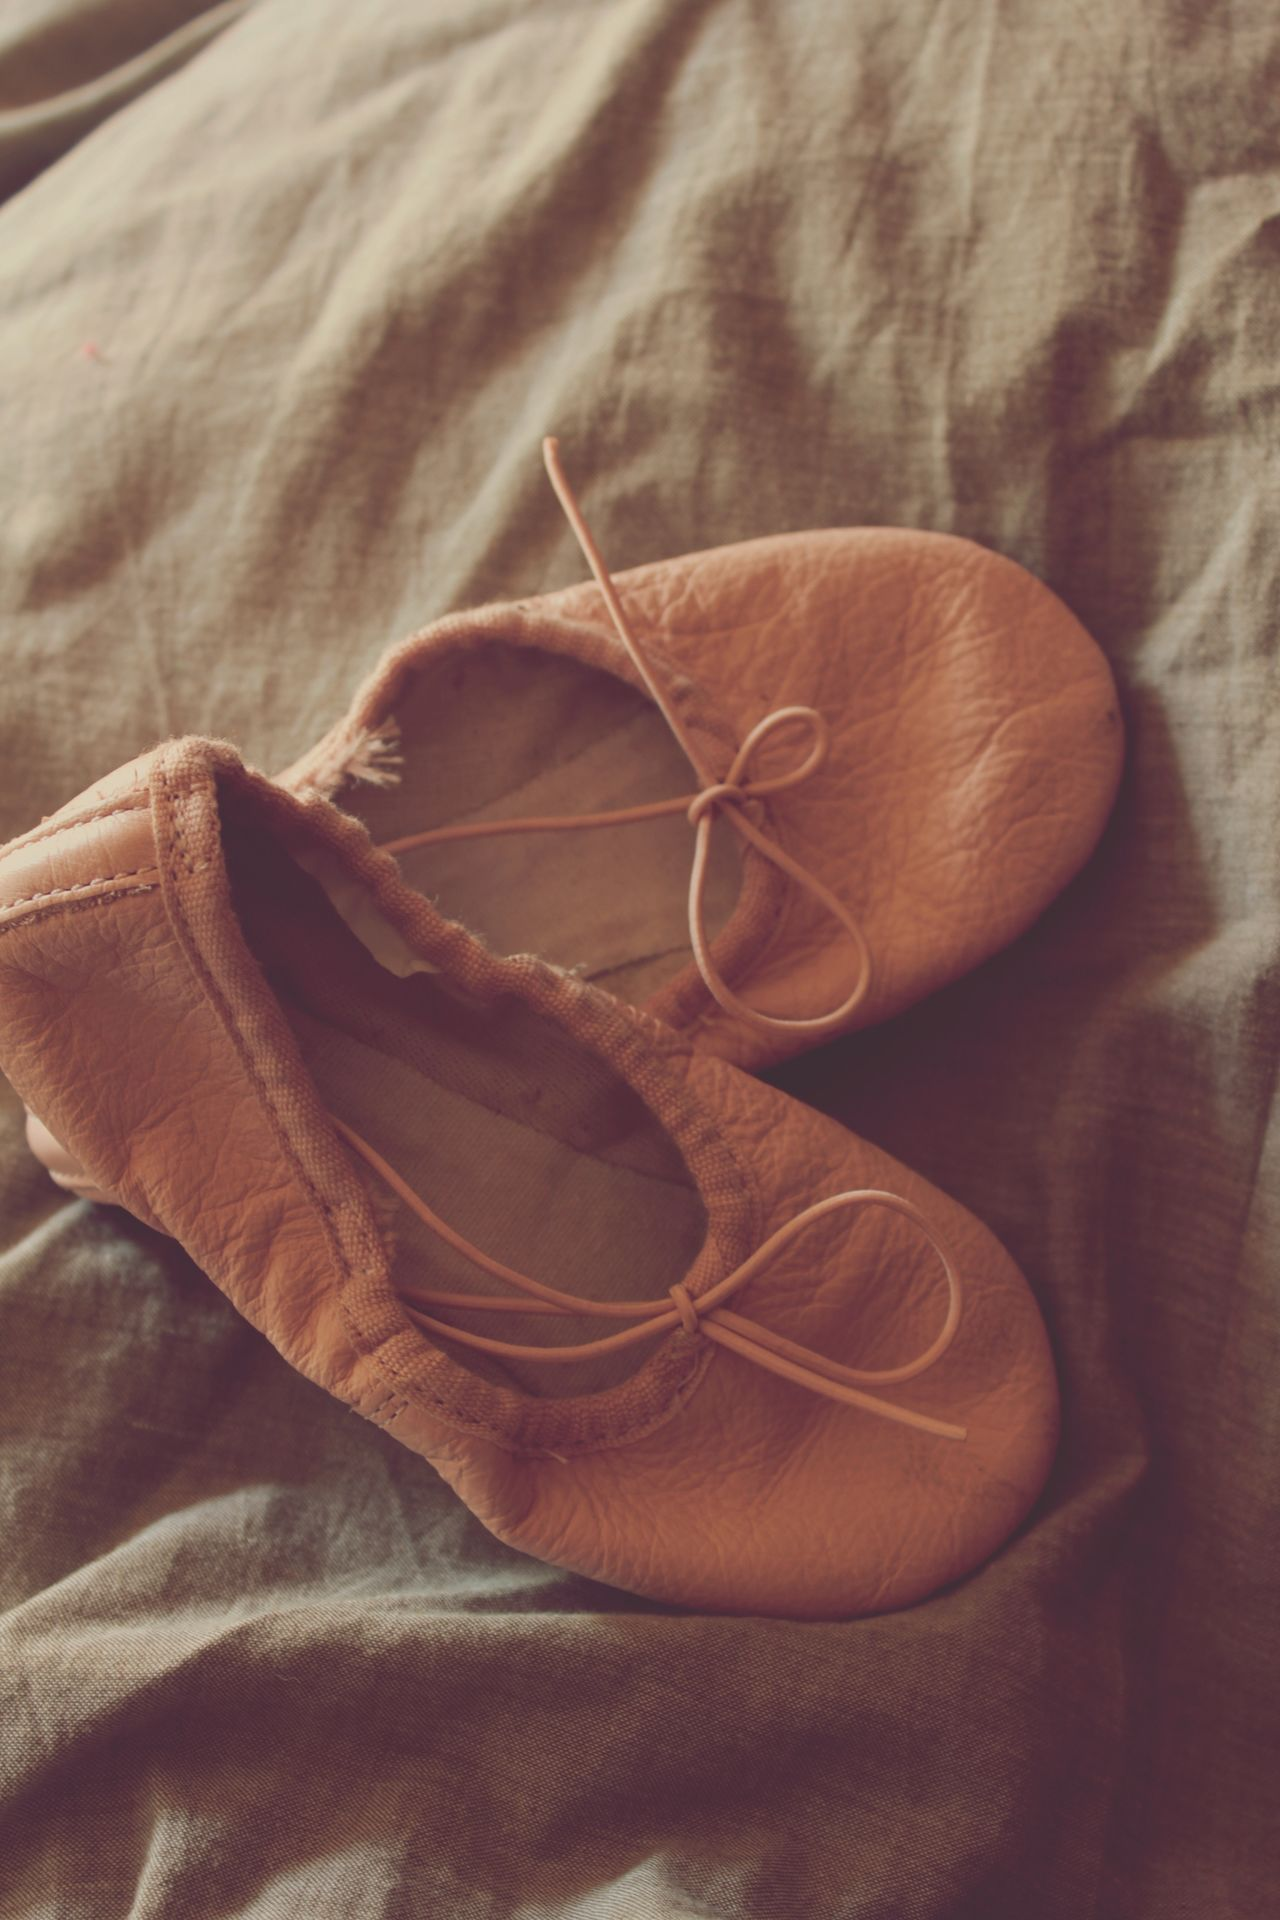 Ballerina Ballet Ballet Dancer Ballet Shoes Ballet Time  Ballett Bed Dance Dance Life Dance Photography Dancing Nostalgia Nostalgic  Pink Color Shoes